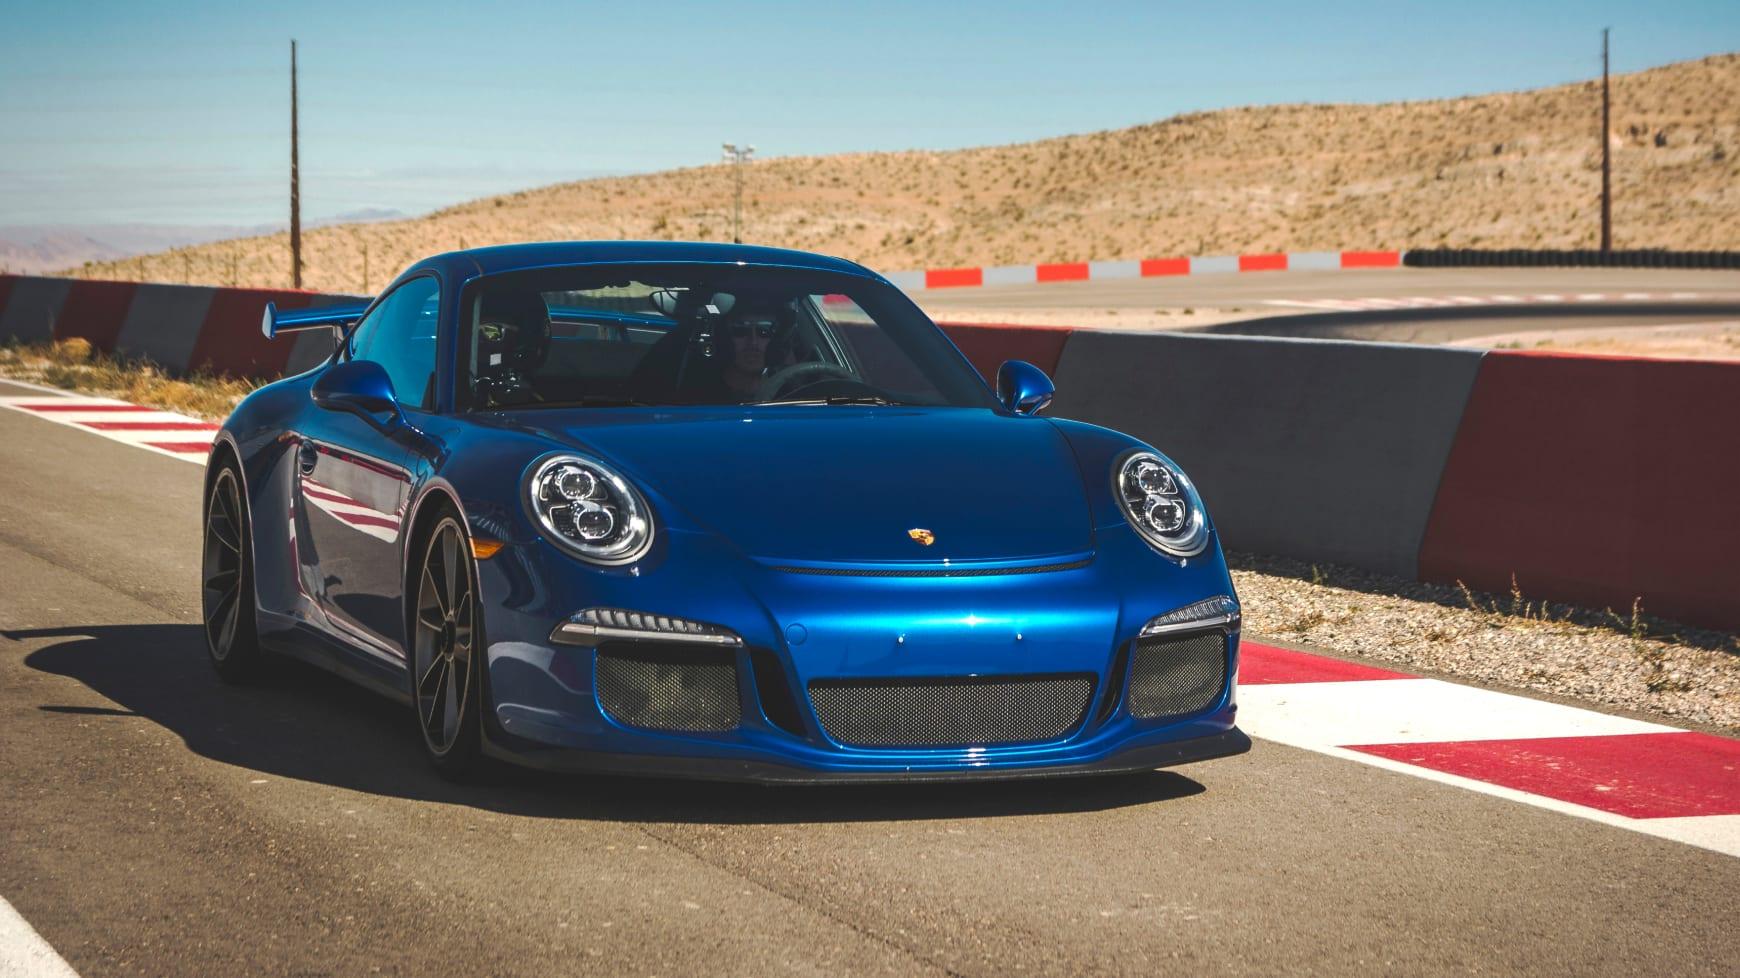 A Porsche on a Race Track